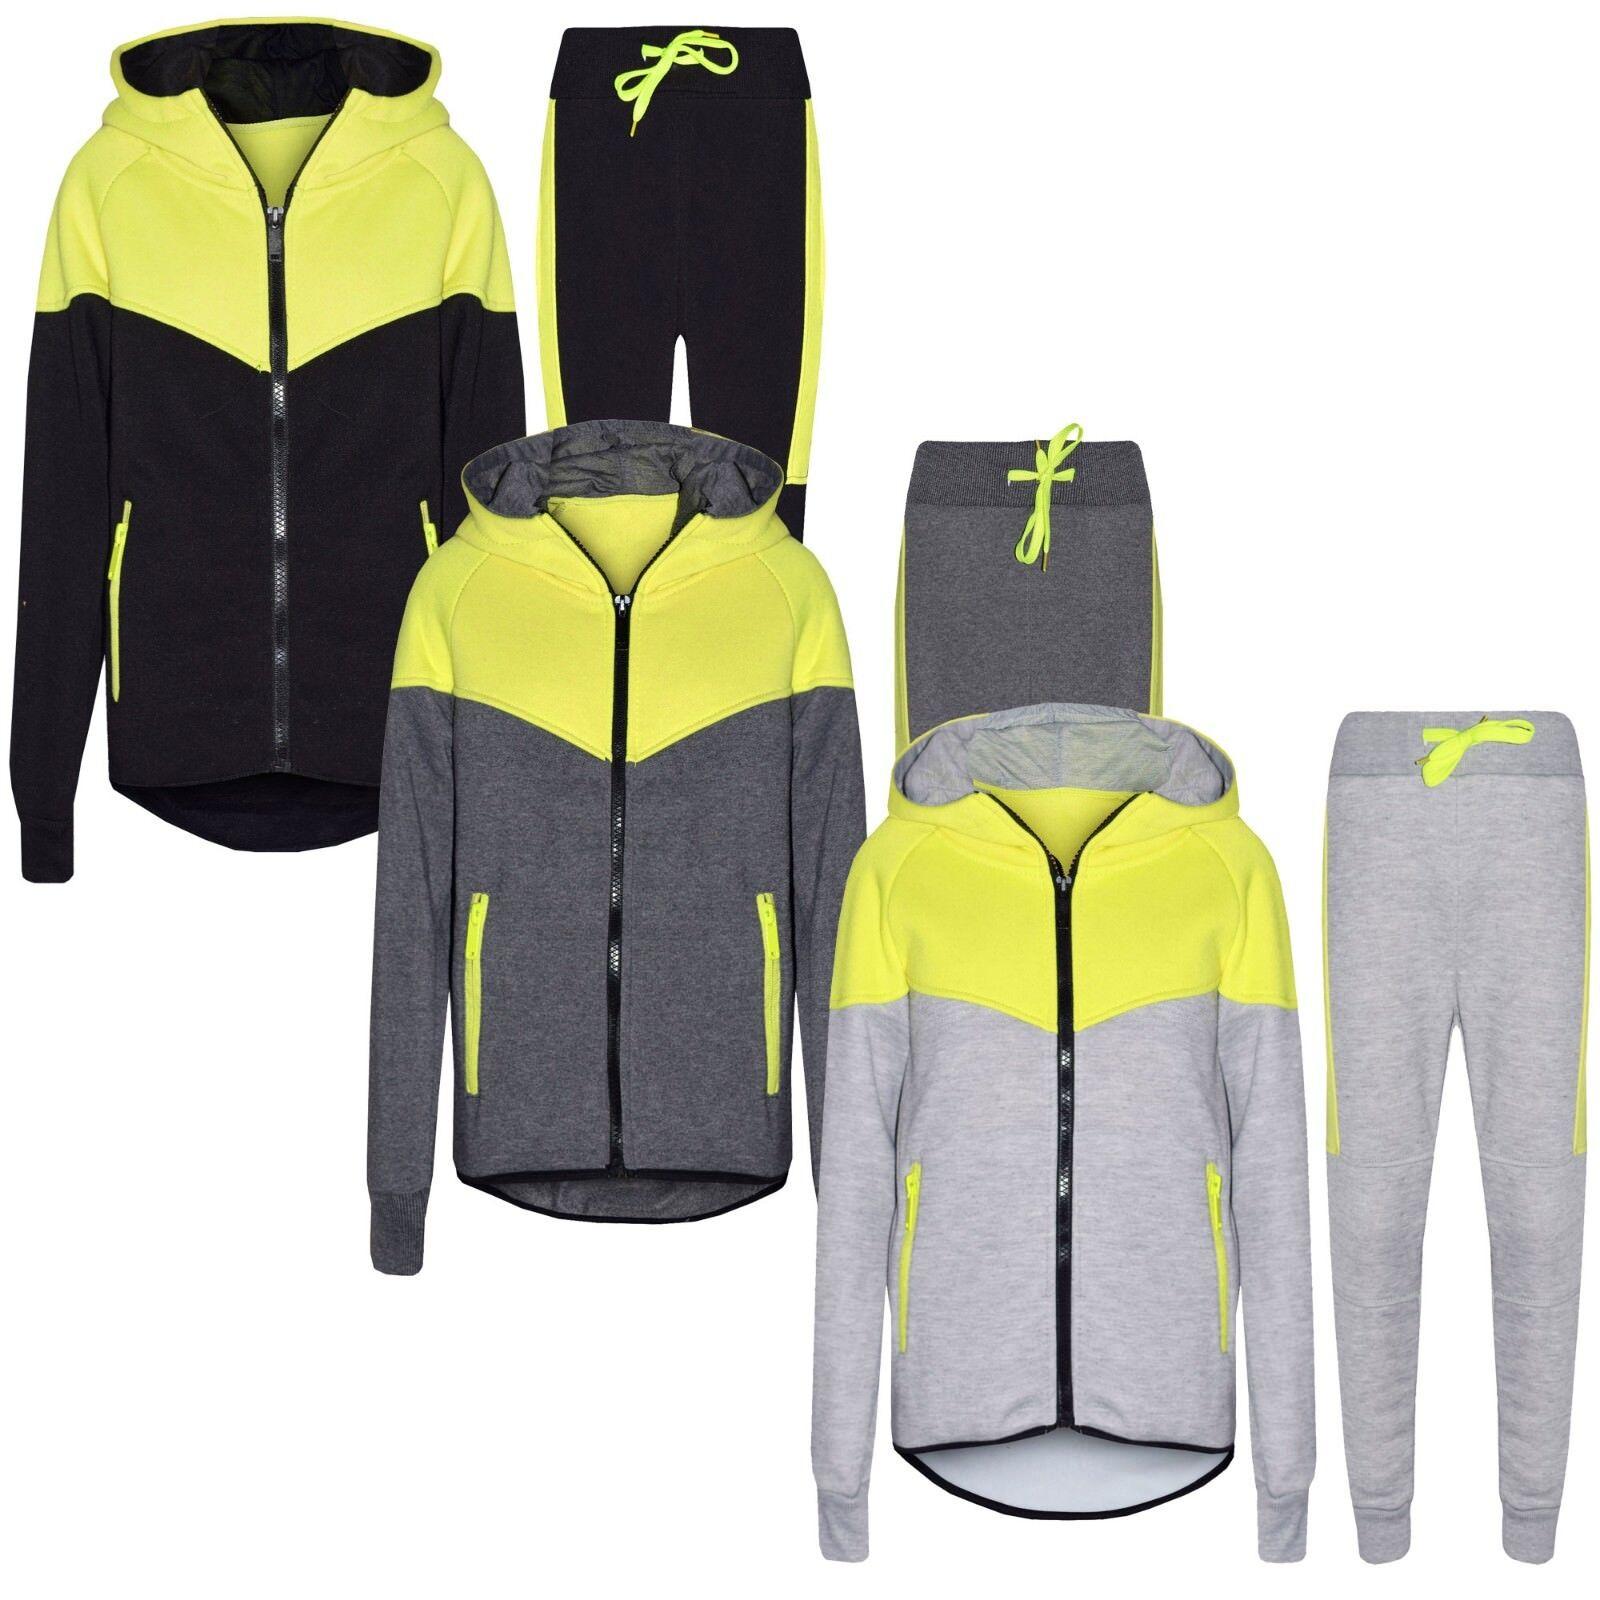 Jungen Slimfit Passform Kinder V Neon-Panel Trainingsanzug mit Kapuze Fleece